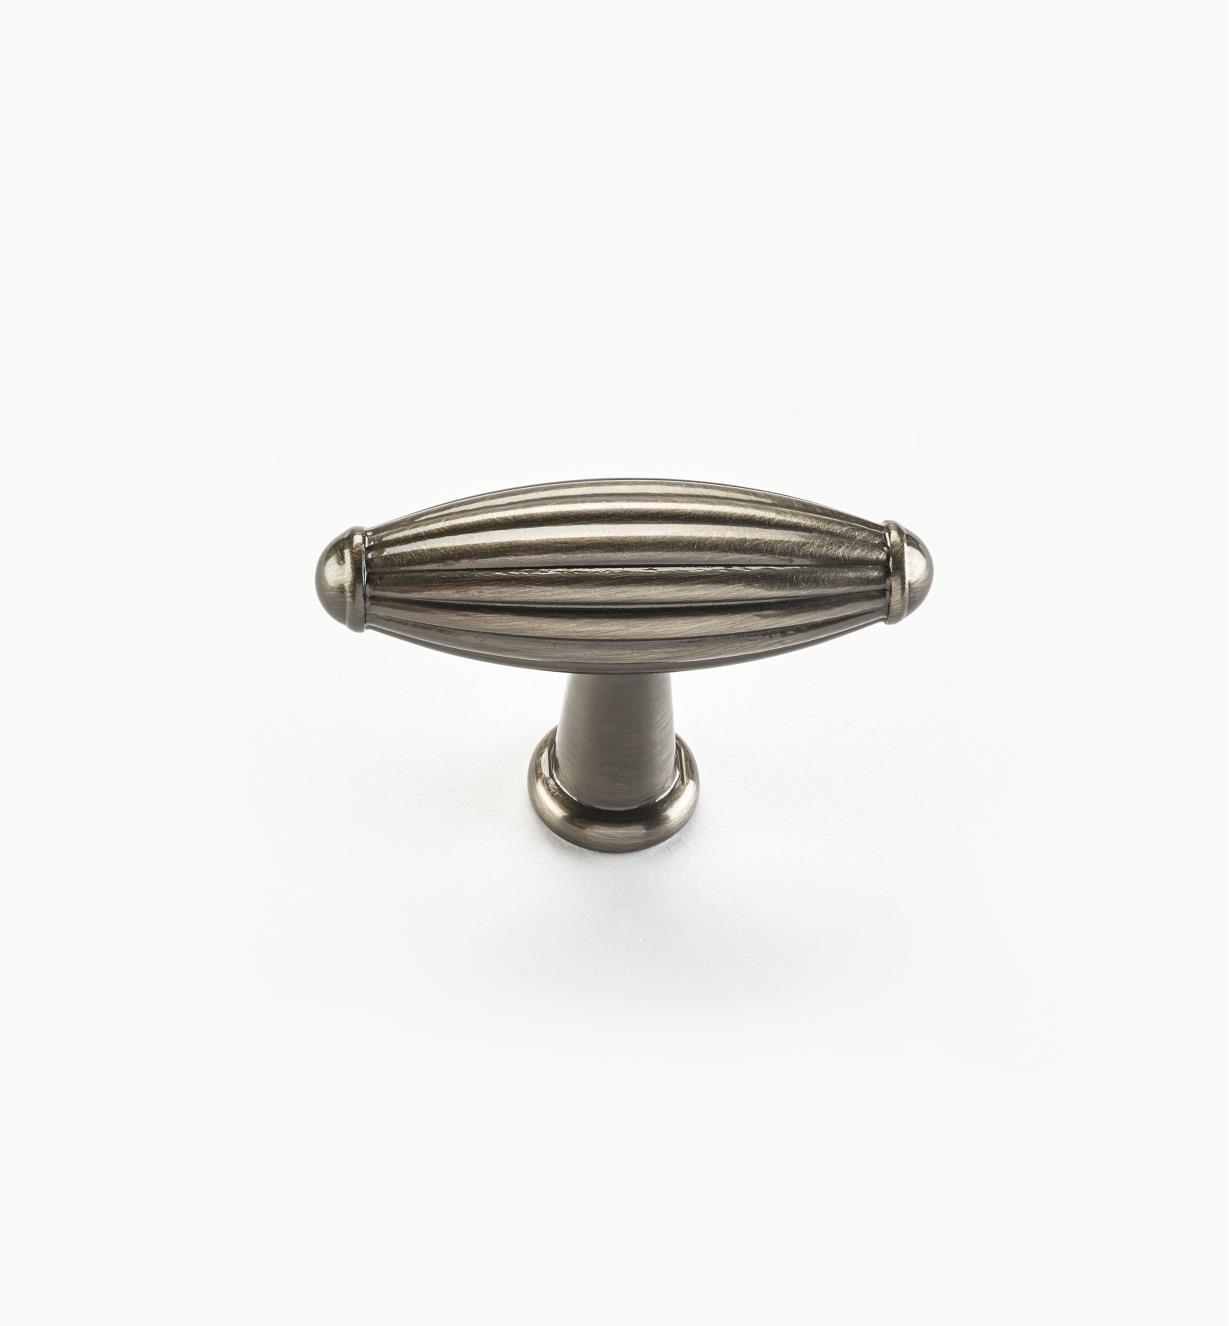 02W4431 - Bouton de 21/4po x 11/2po, série Olive, fini nickel antique